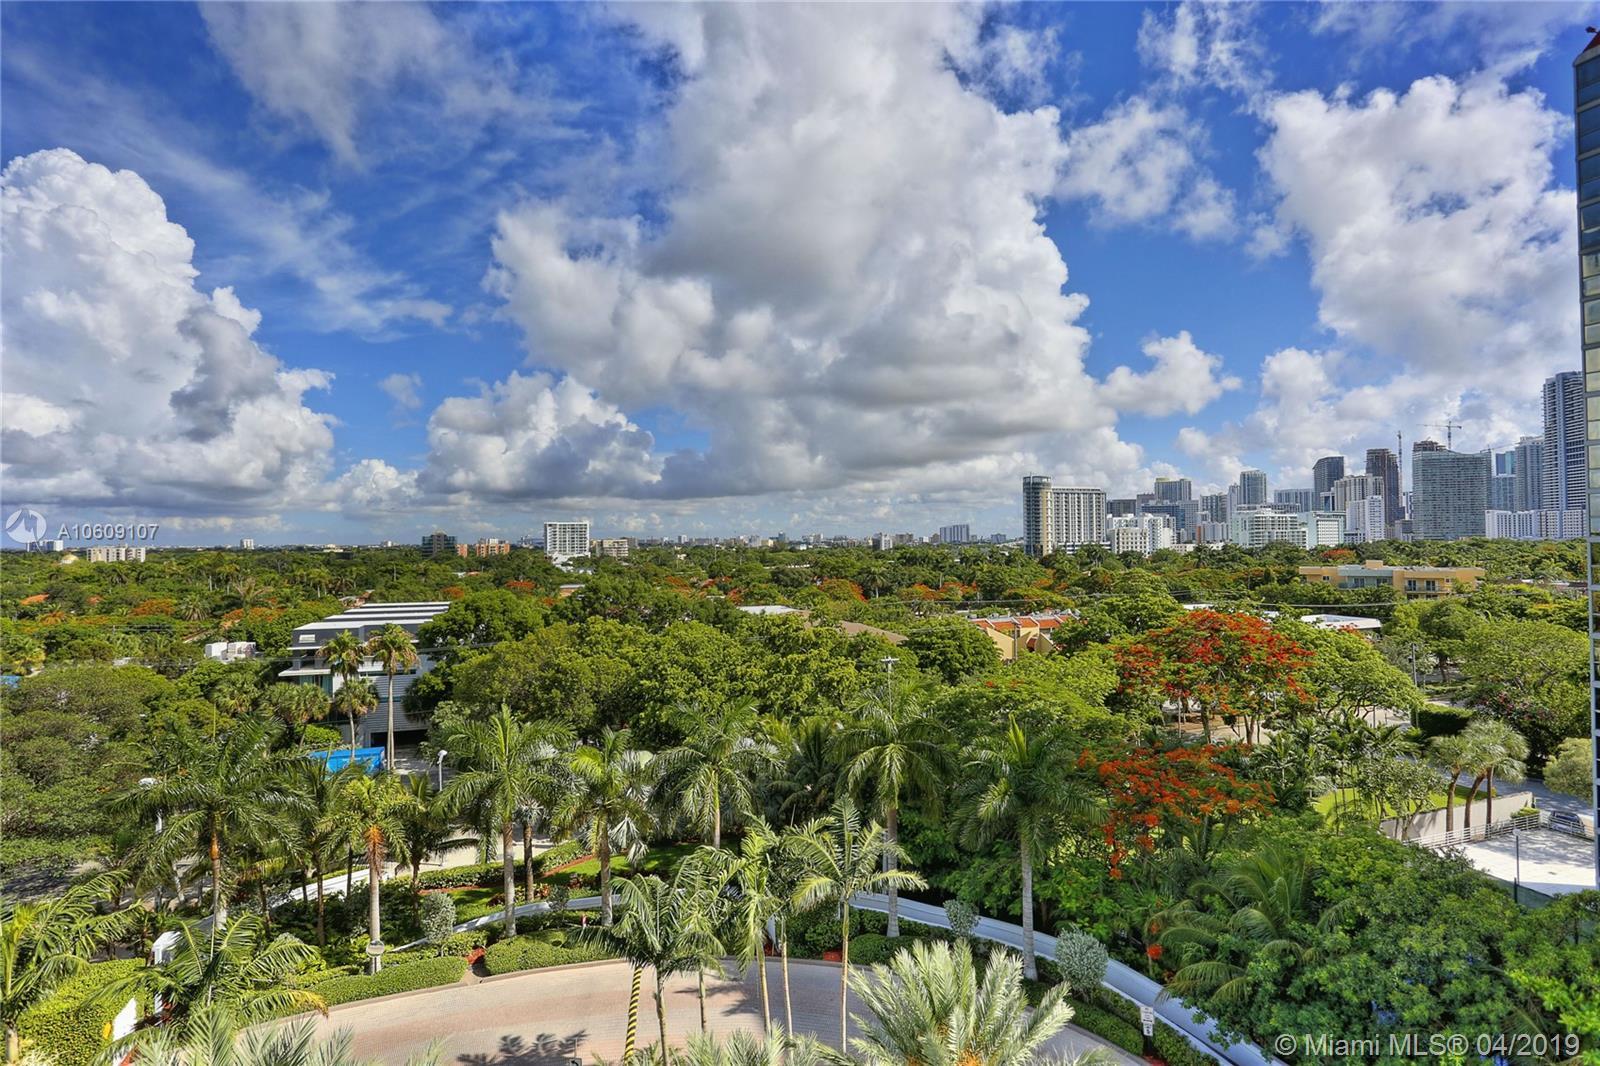 Аренда квартиры по адресу 2101 Brickell Ave, Miami, FL 33129 в США